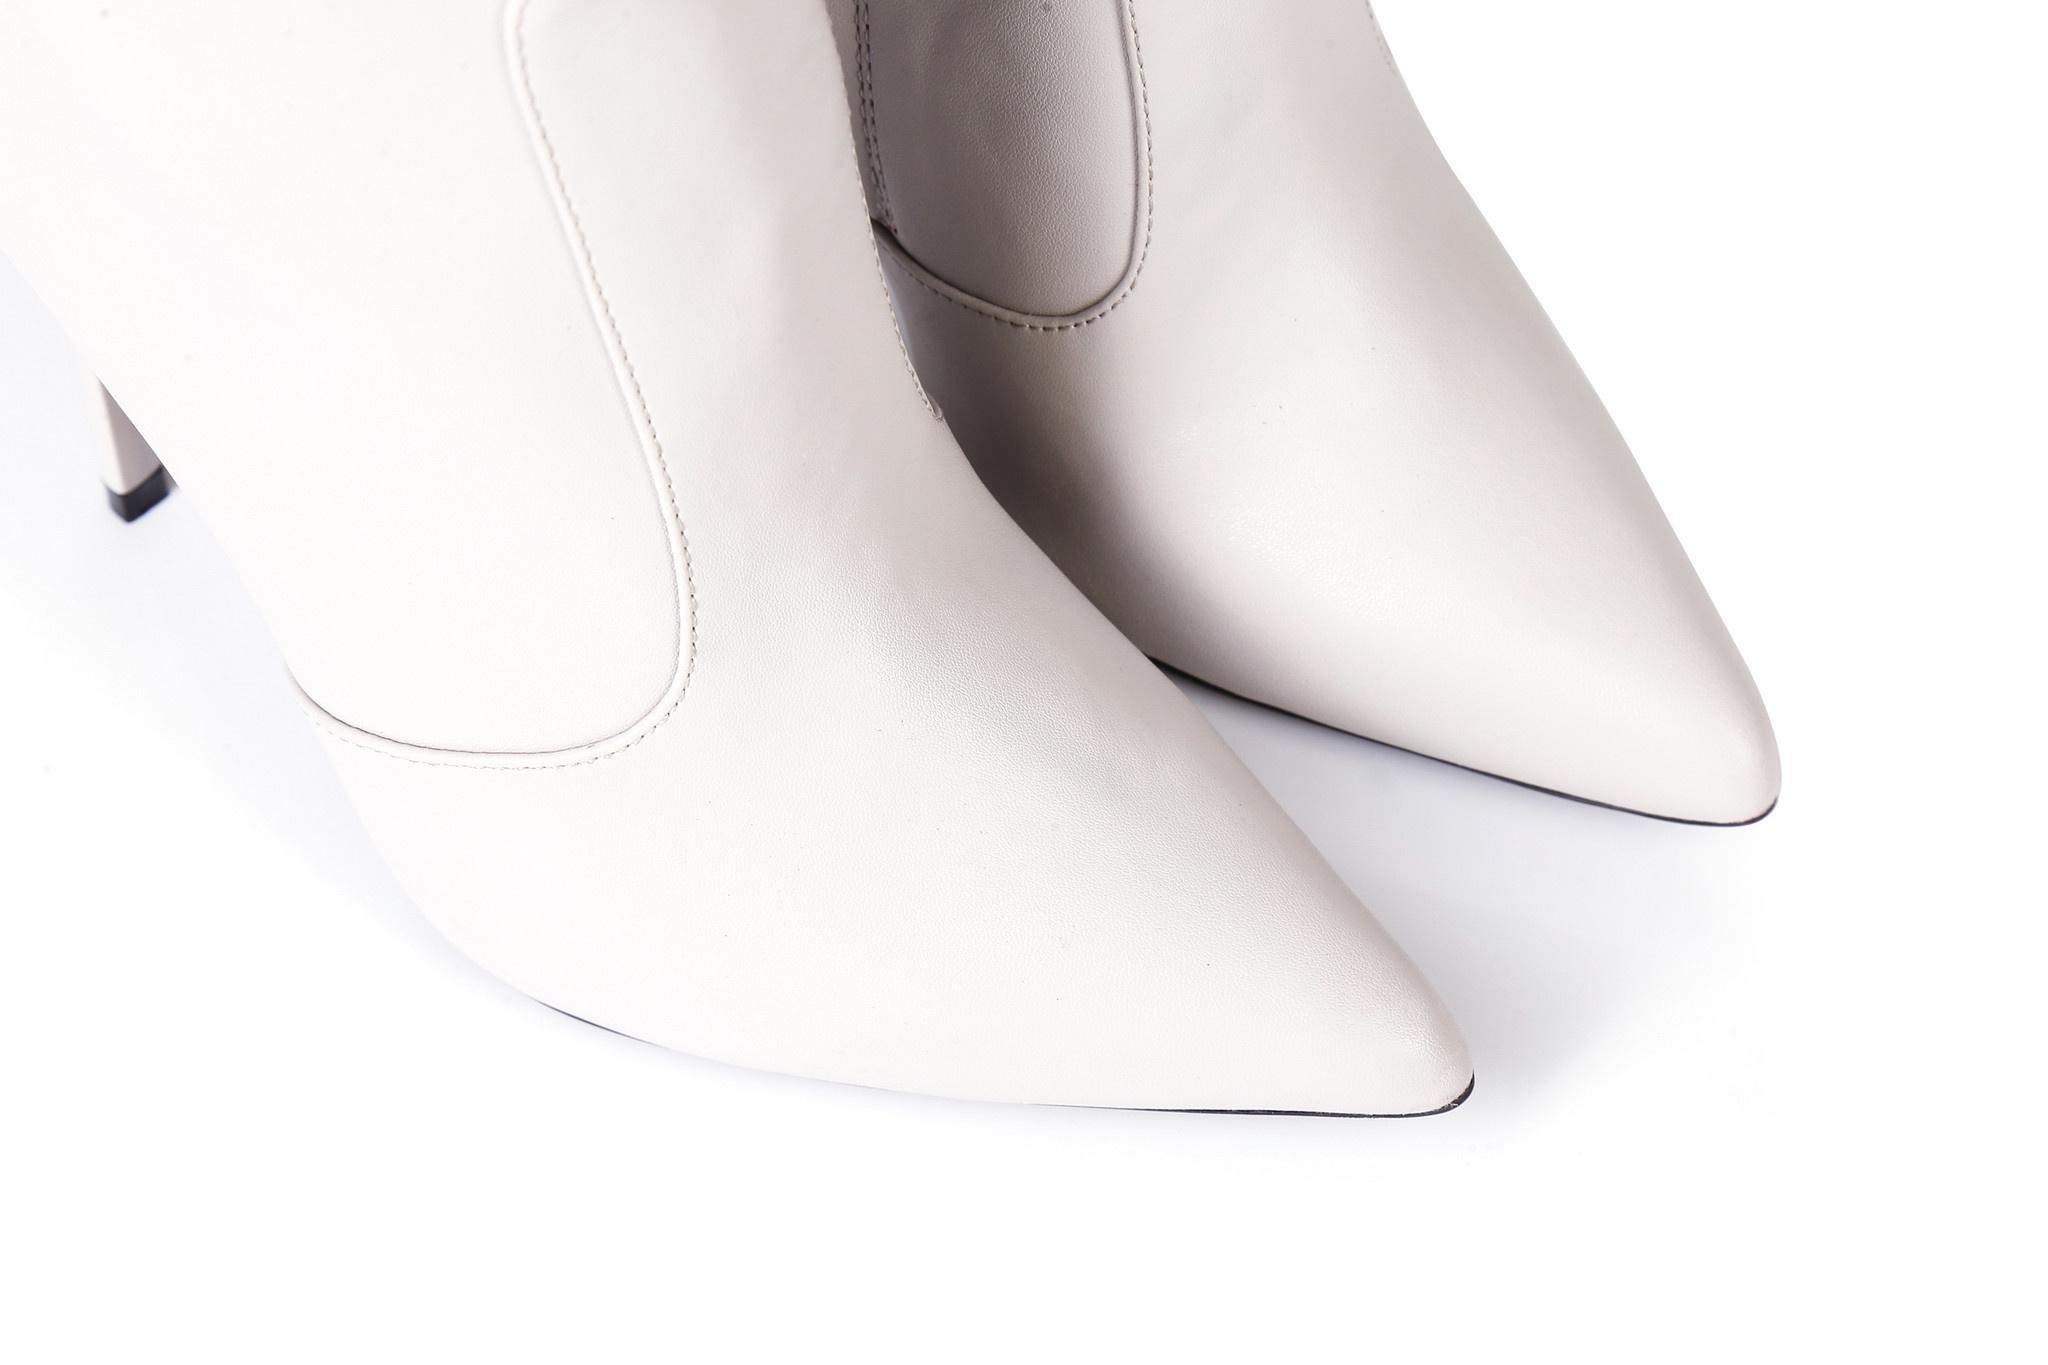 Giaro ZIRA   LIGHT GREY   KNEE BOOTS   Italian Style